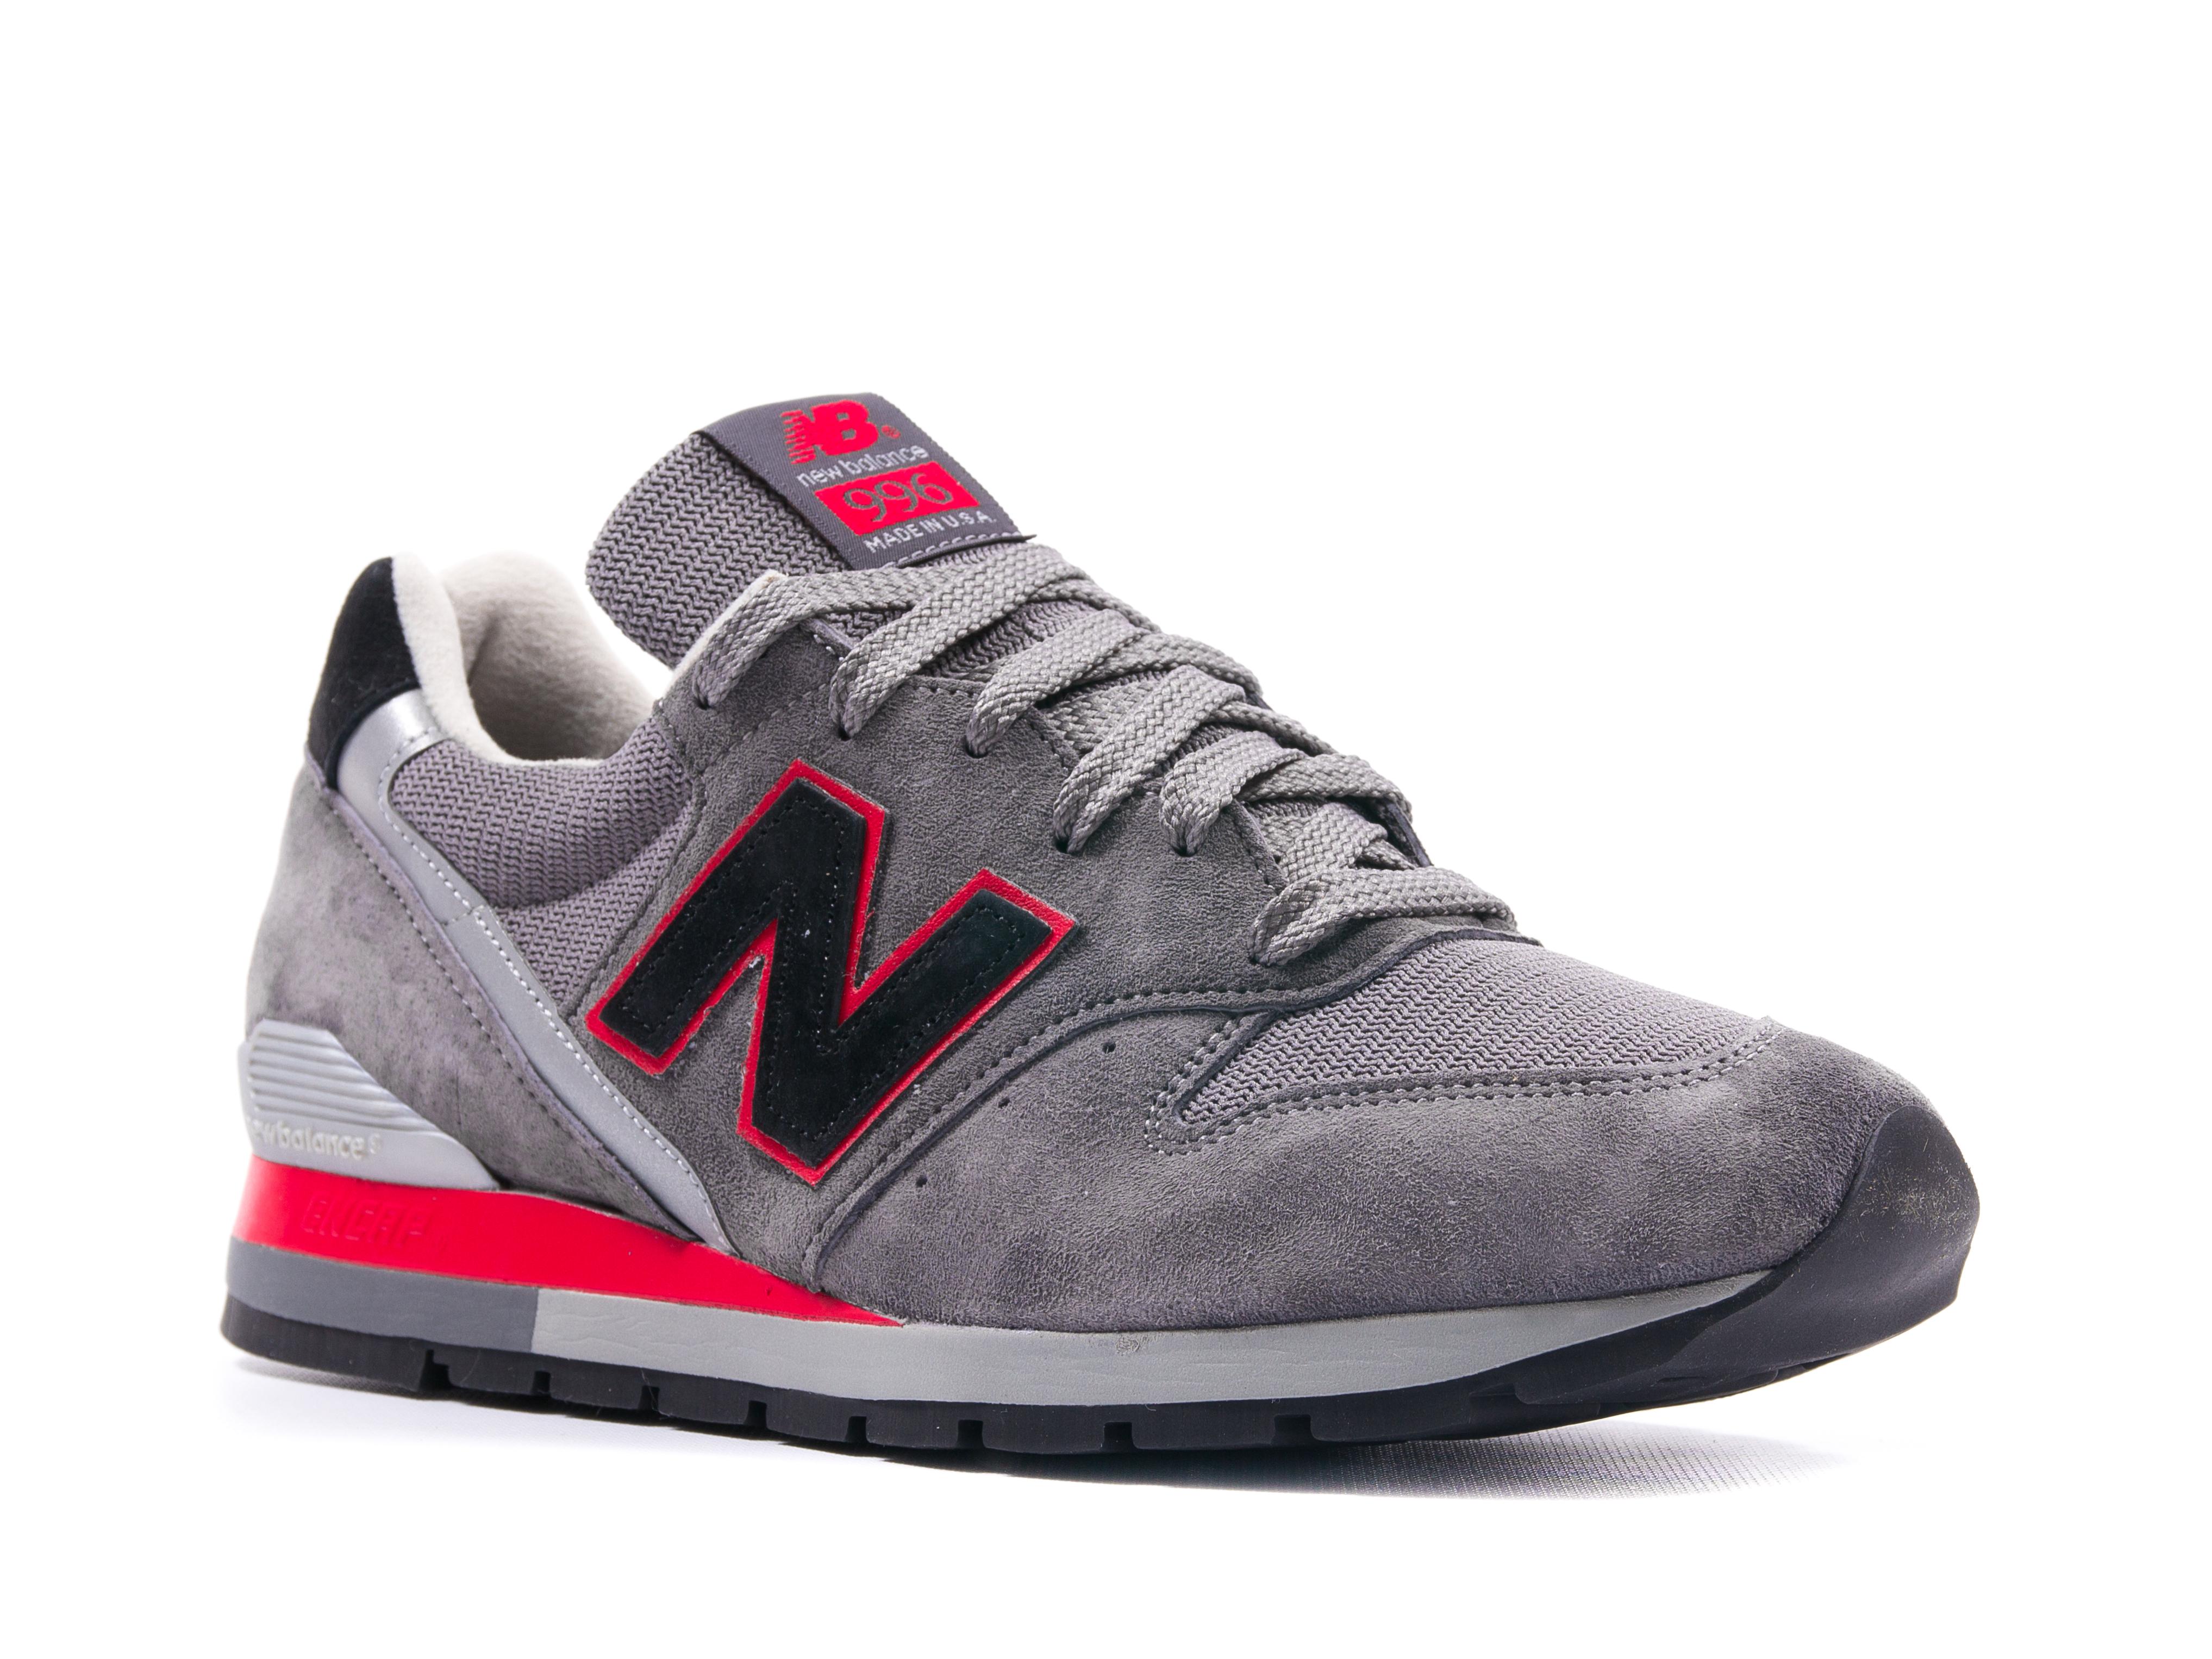 New Balance Packer Shoes